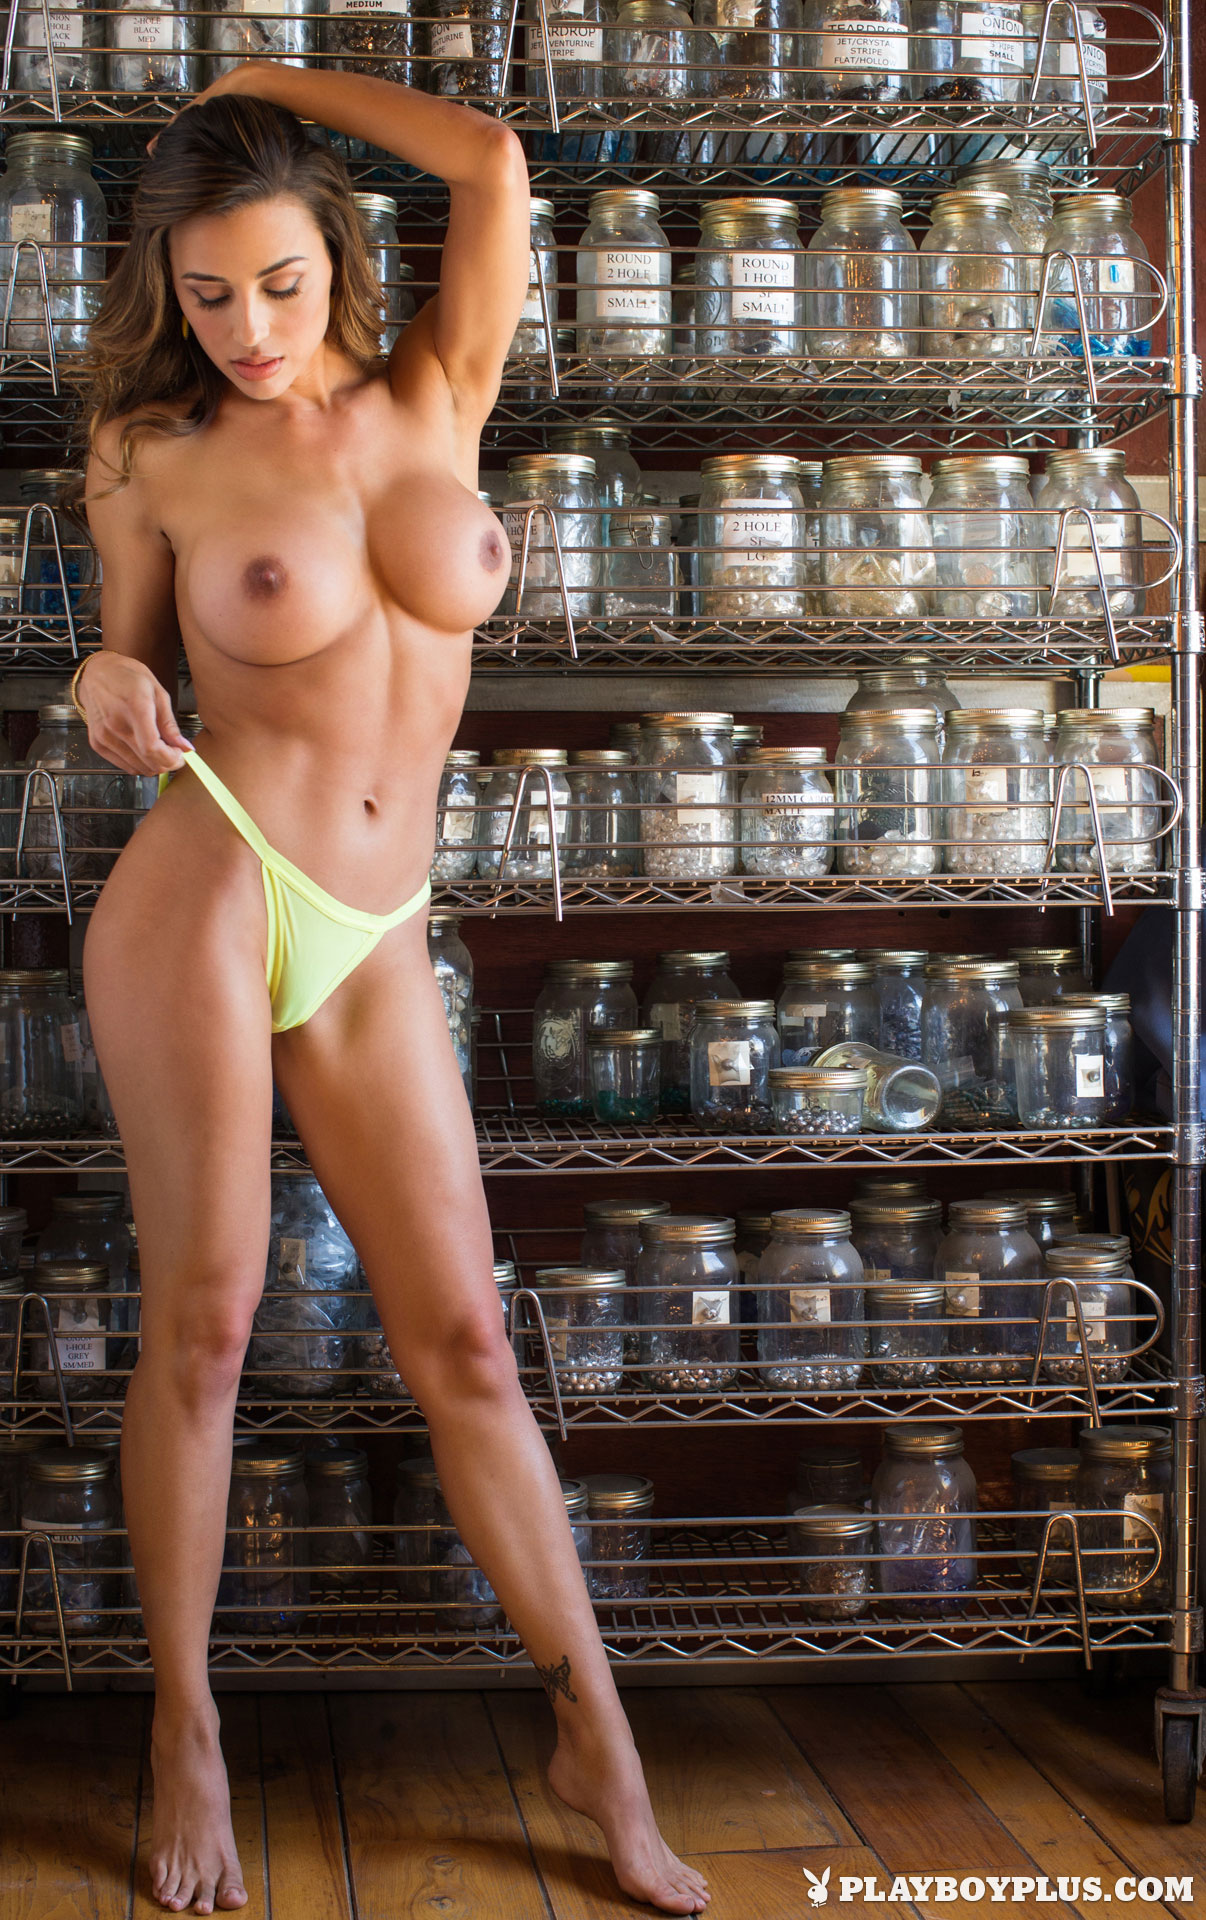 Ana Cheri Playboy ana cheri passion play naked playboy 06 redbust